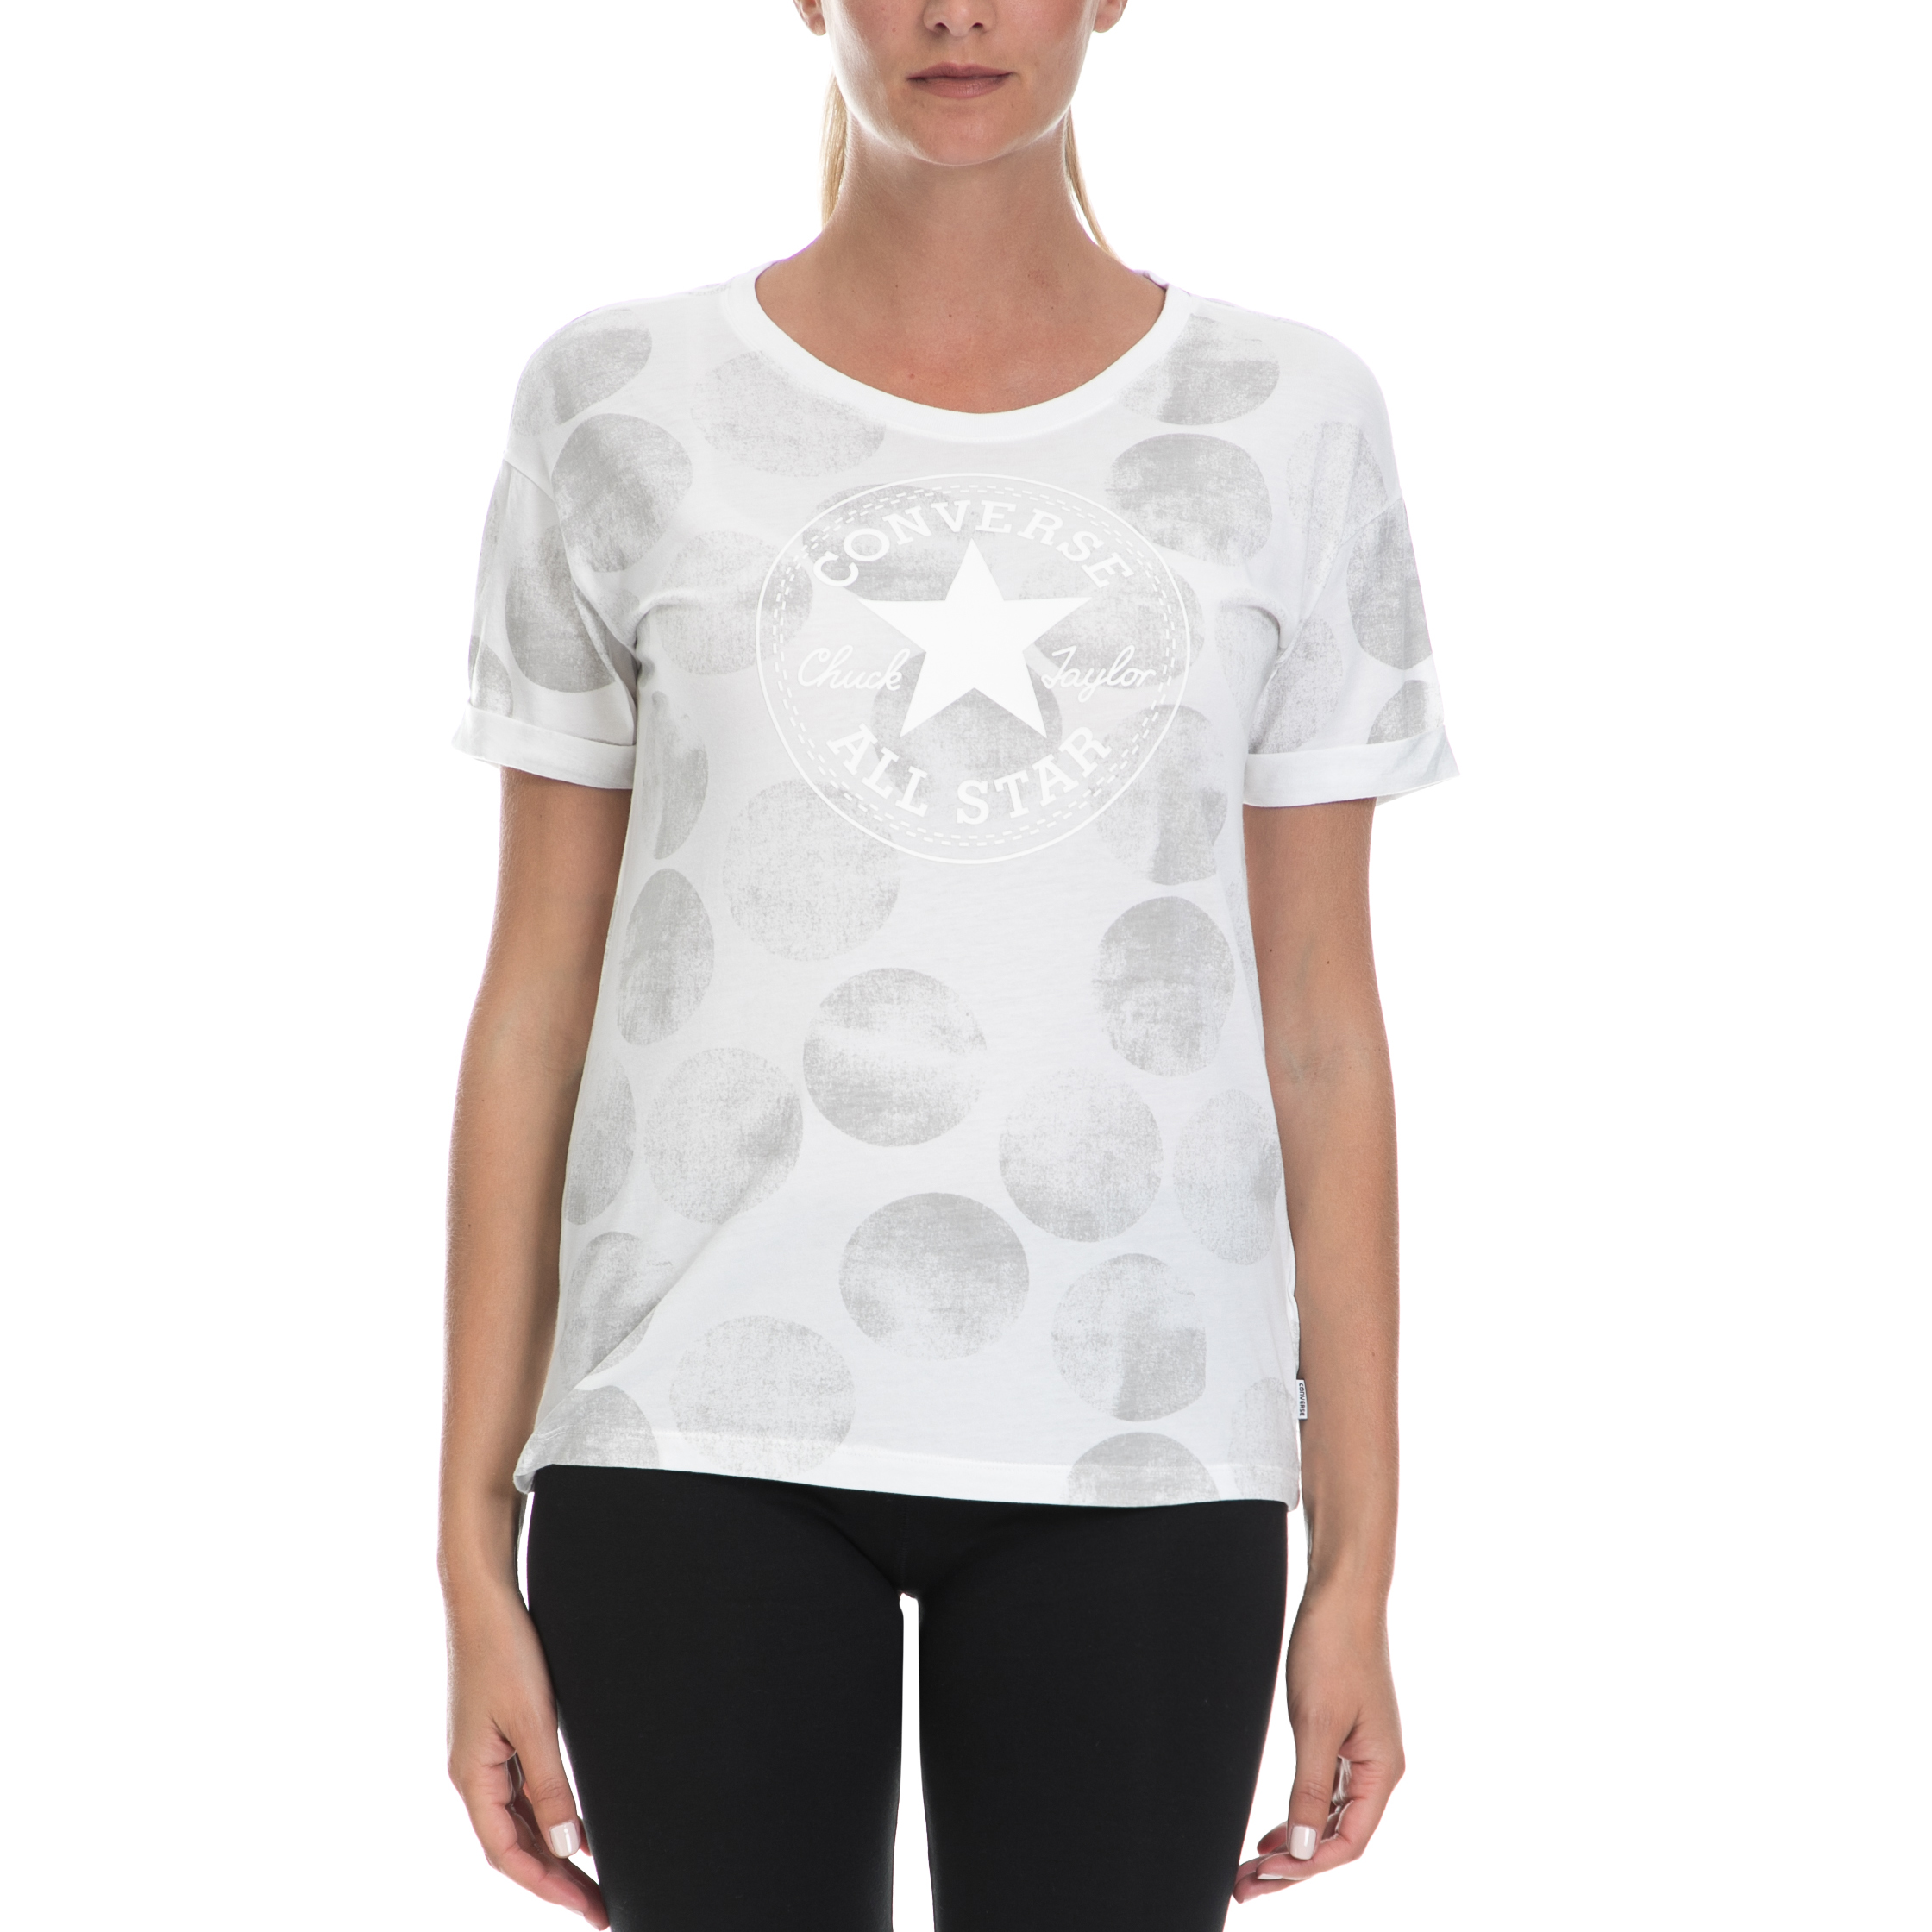 CONVERSE - Γυναικεία μπλούζα CONVERSE λευκή γυναικεία ρούχα αθλητικά t shirt τοπ